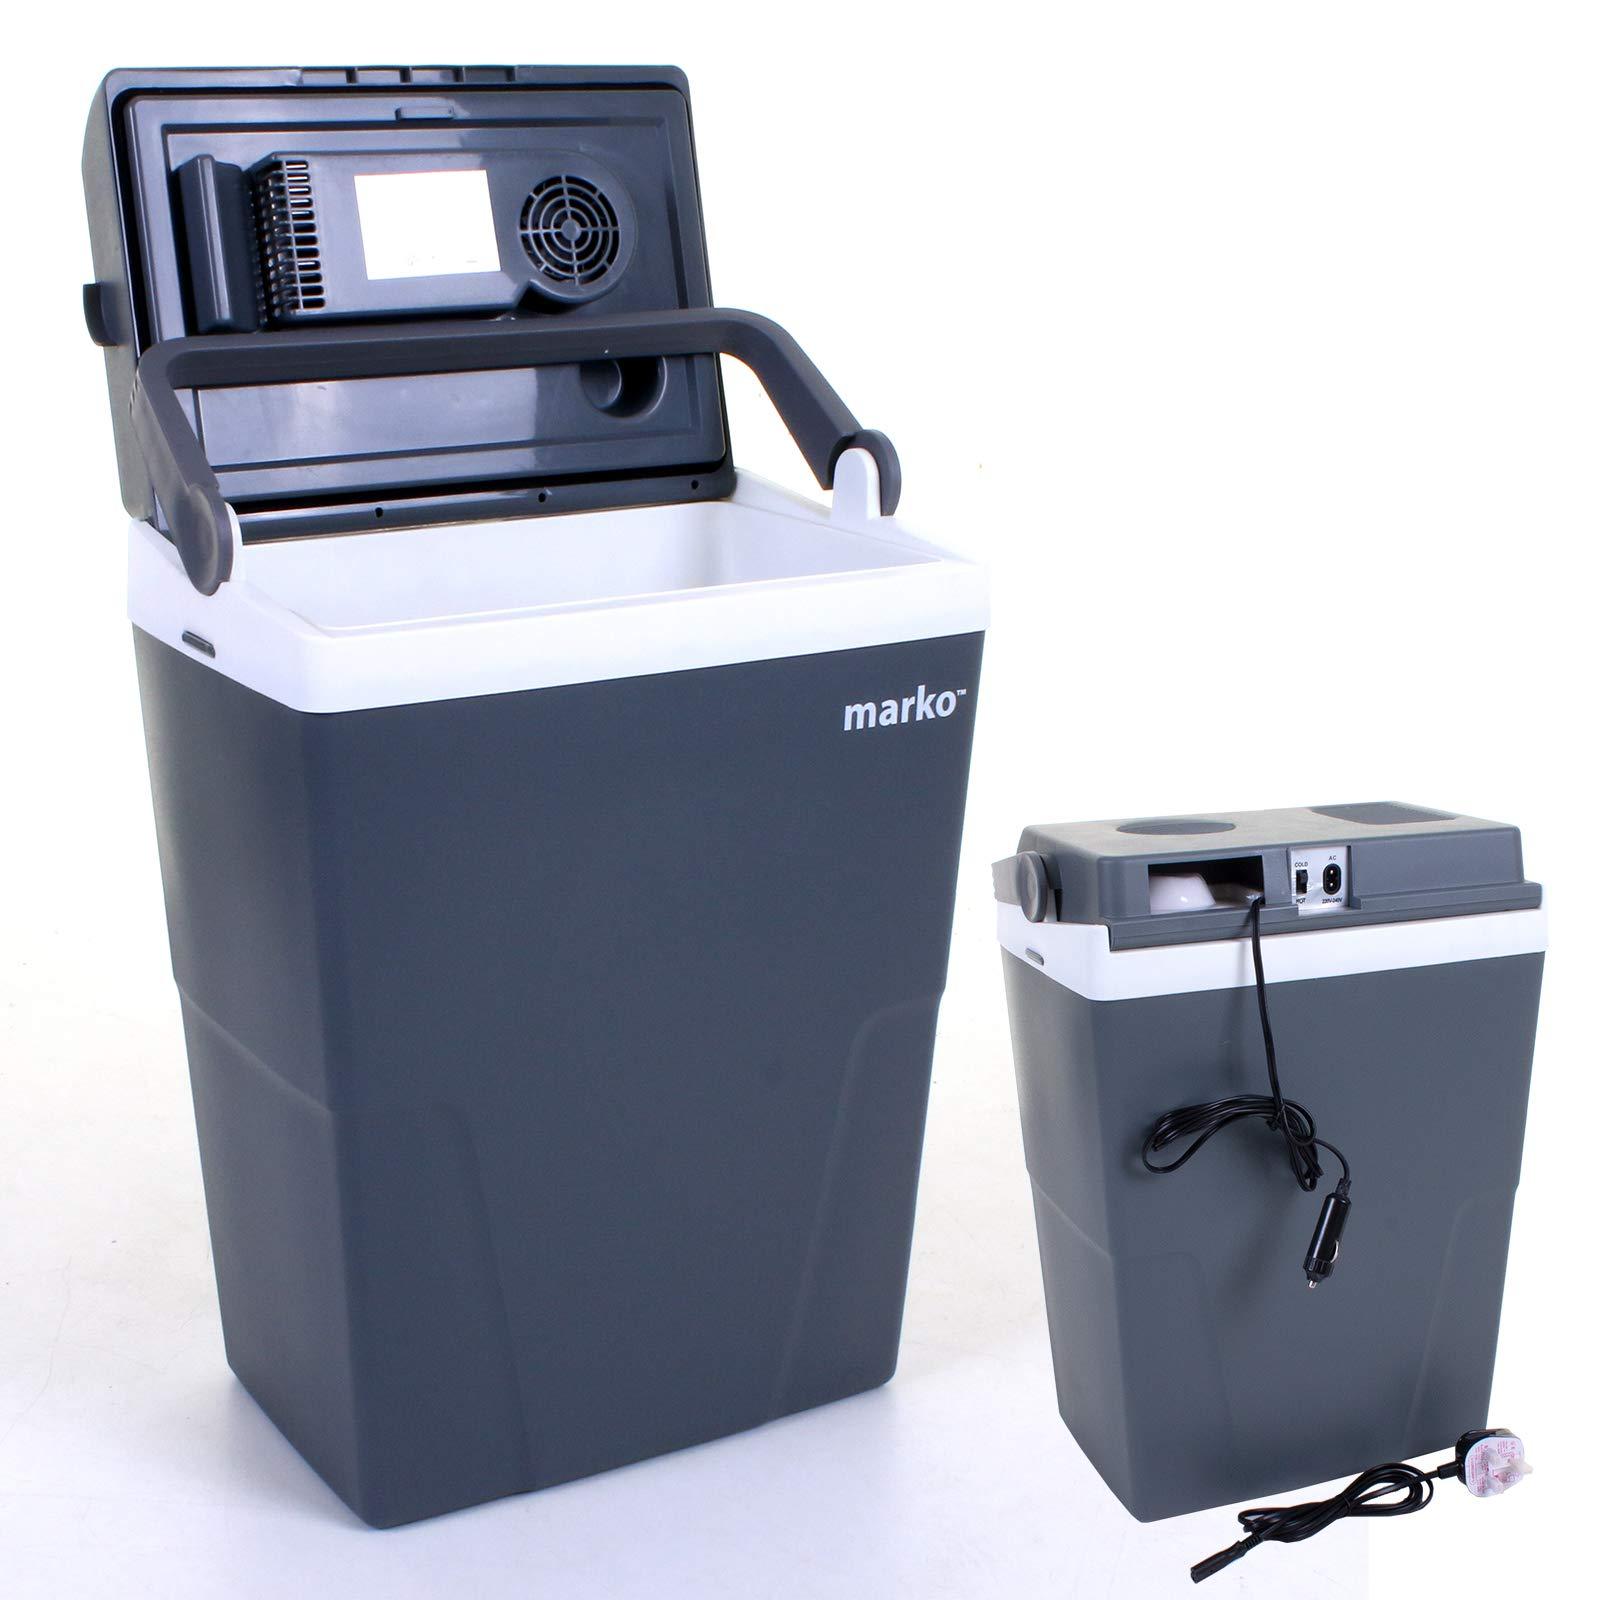 Mobicool Mirabelle MM24 DC 20 L Electric Coolbox 12 V Blue